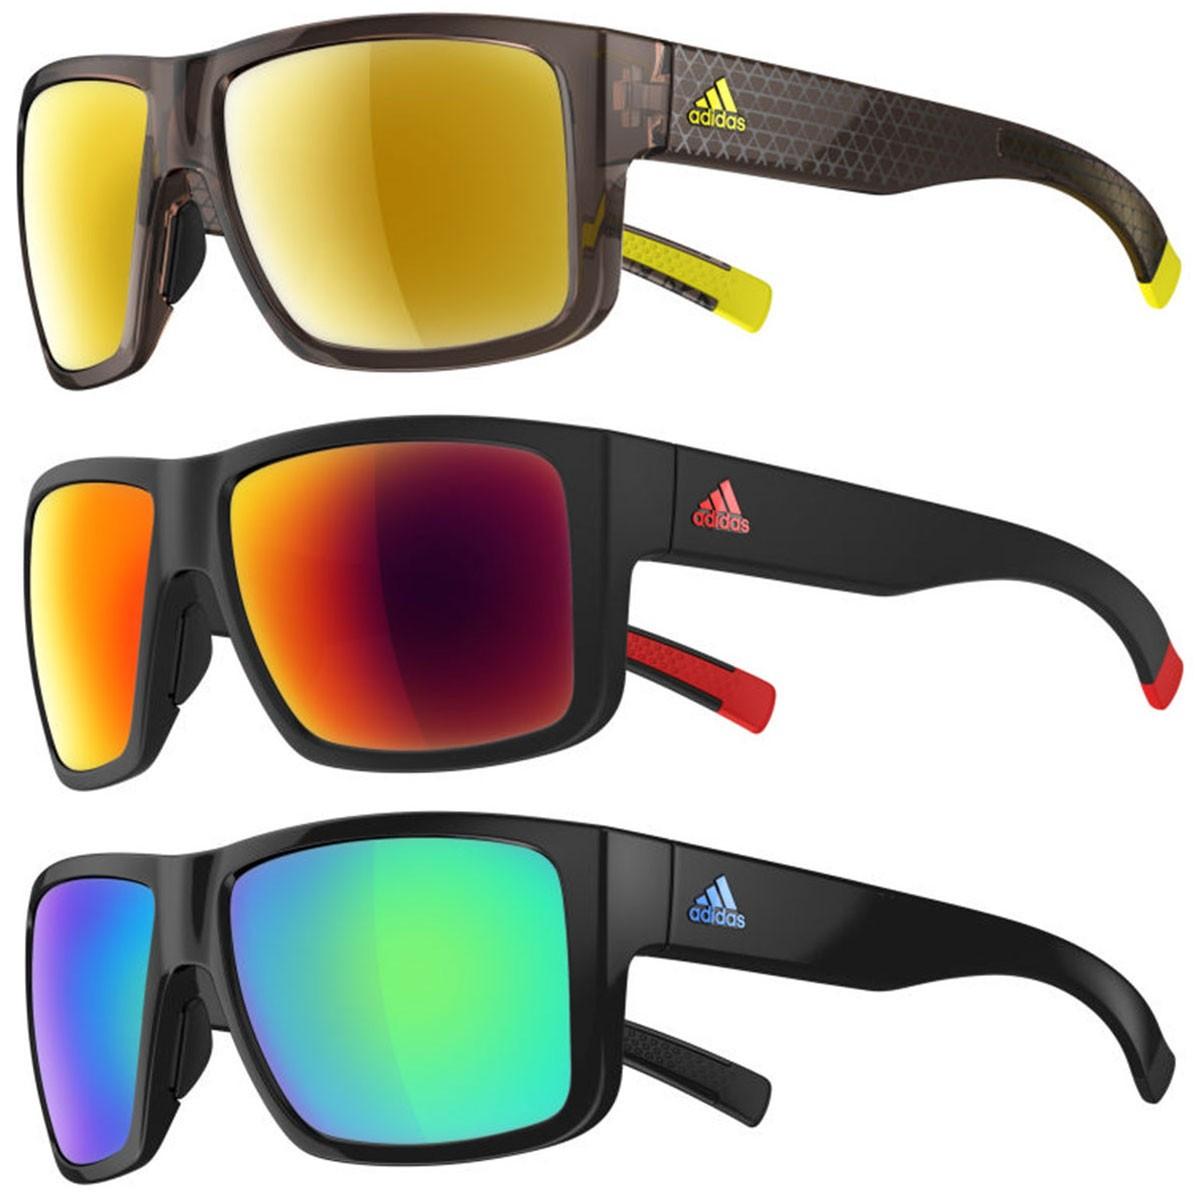 f2d42d6e38f9 Sport Rx Adidas Sunglasses